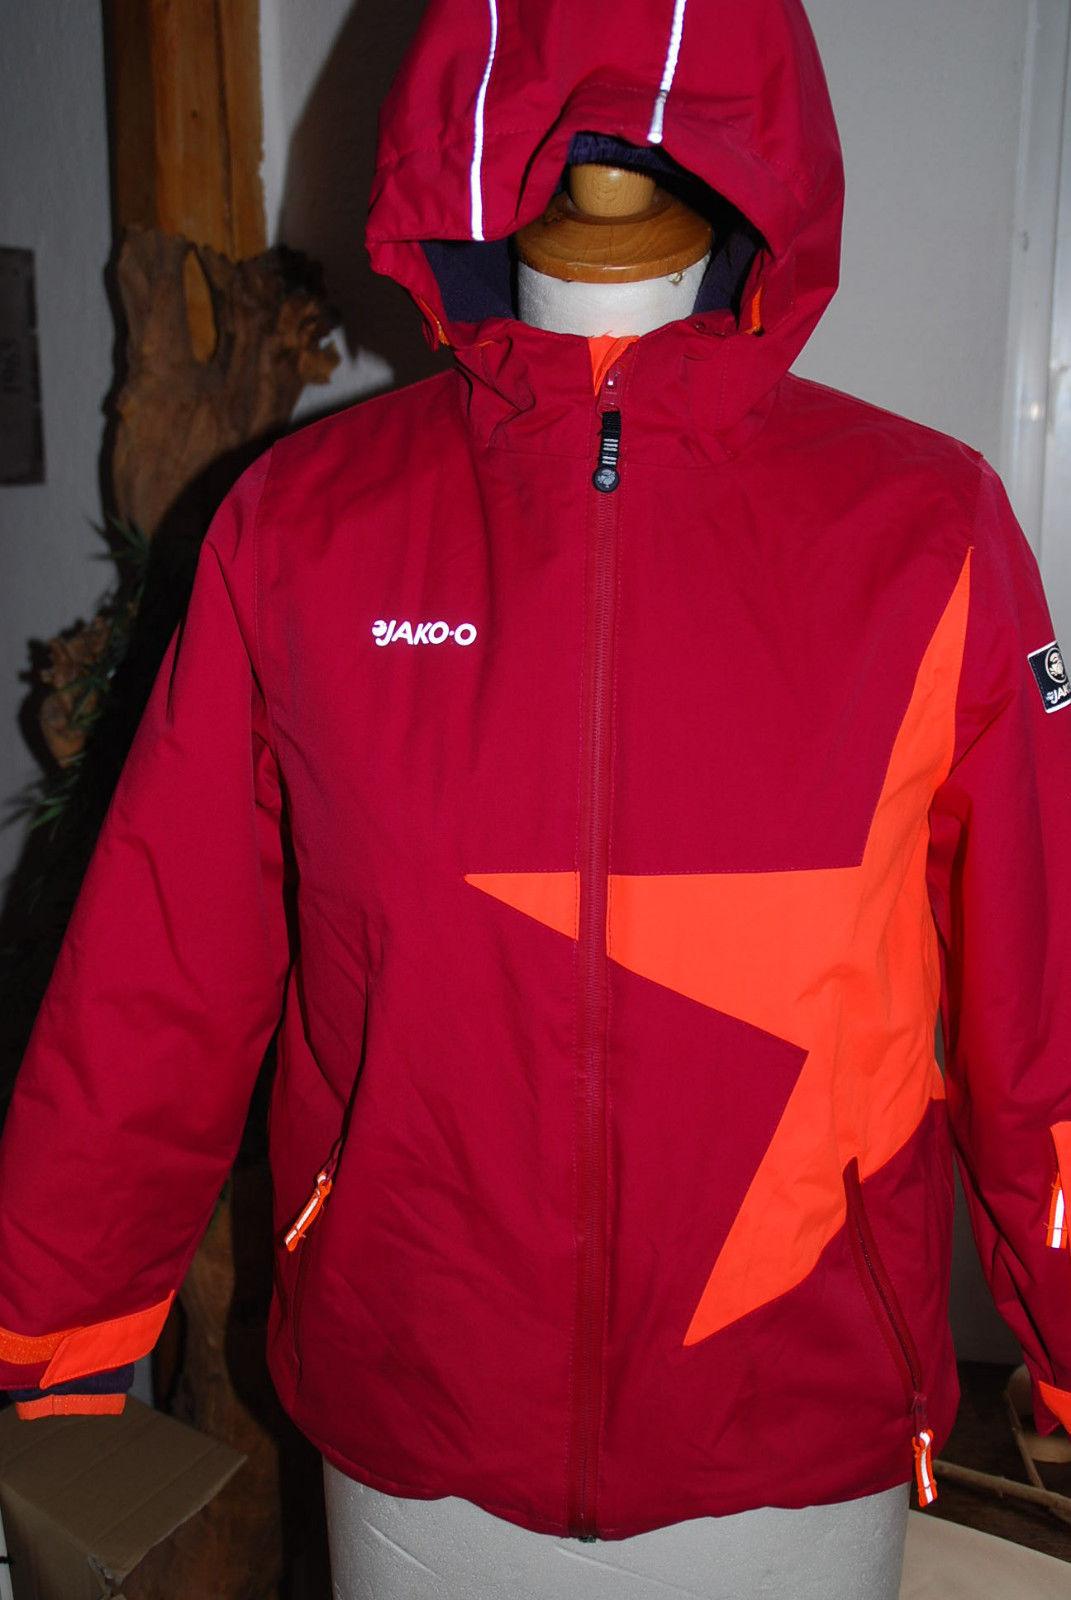 Jako o  Ski / Winterjacke Stern ***Gr.140/146 ***TOP